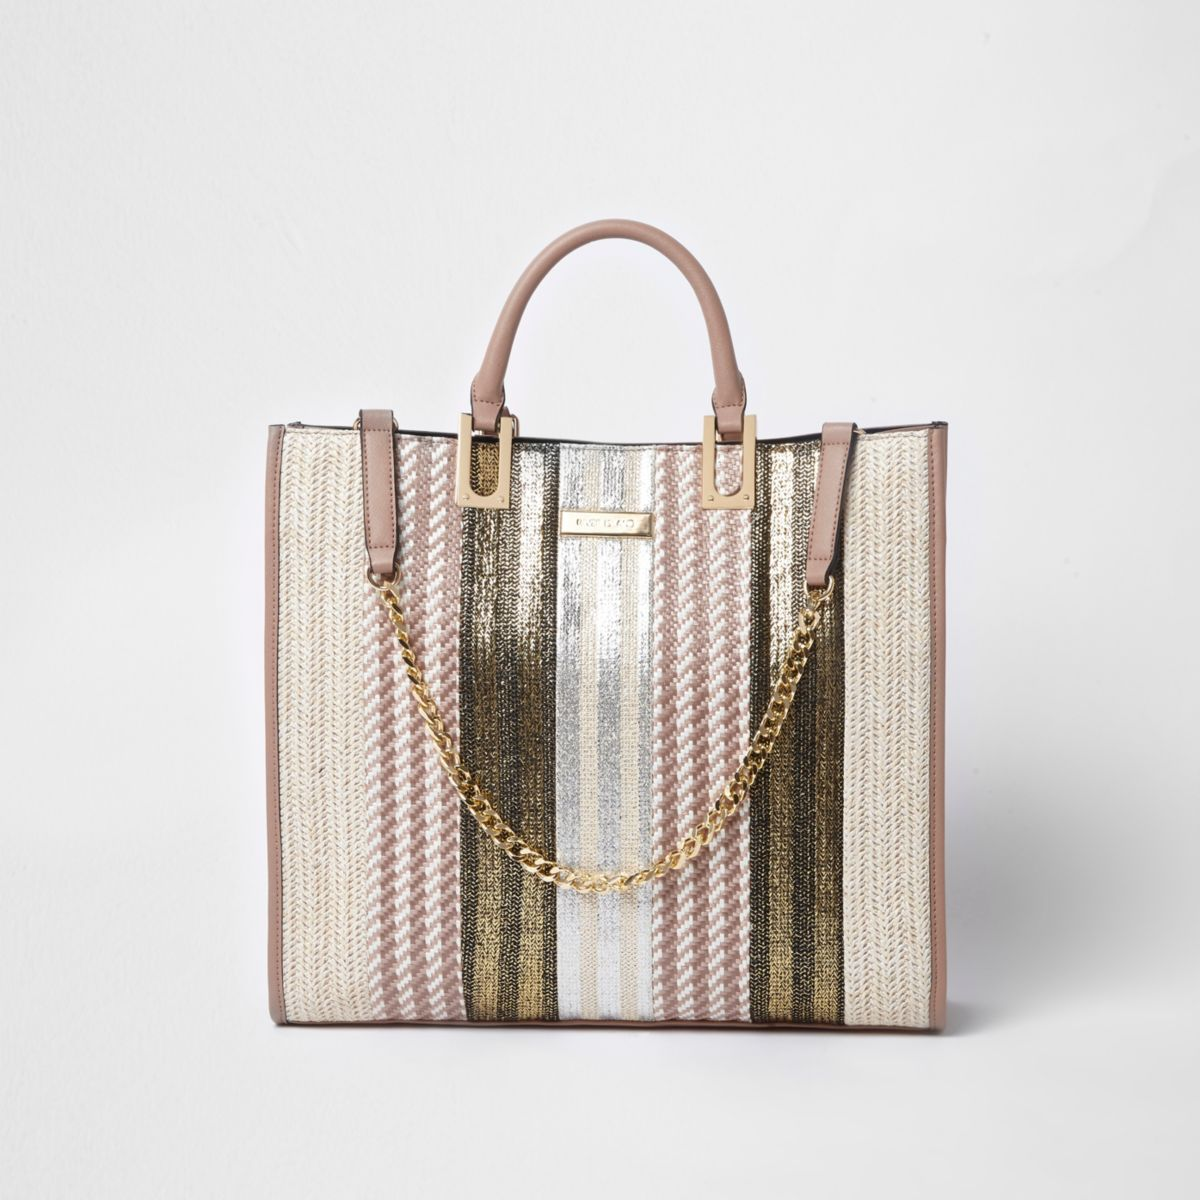 Beige metallic woven straw shopper bag